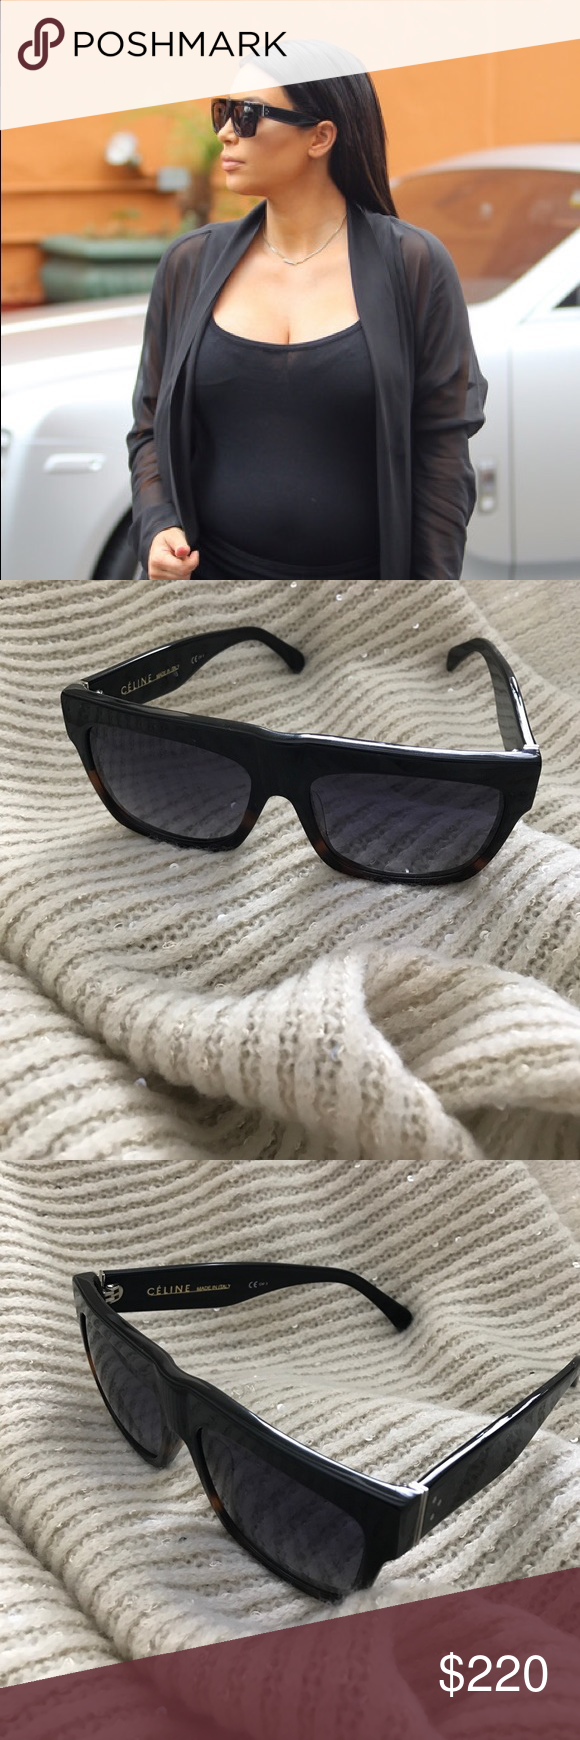 28a7f62d0302d Celine ZZ-Top Sunglasses Black Tortoise CL41066 S As seen on many  celebrities including